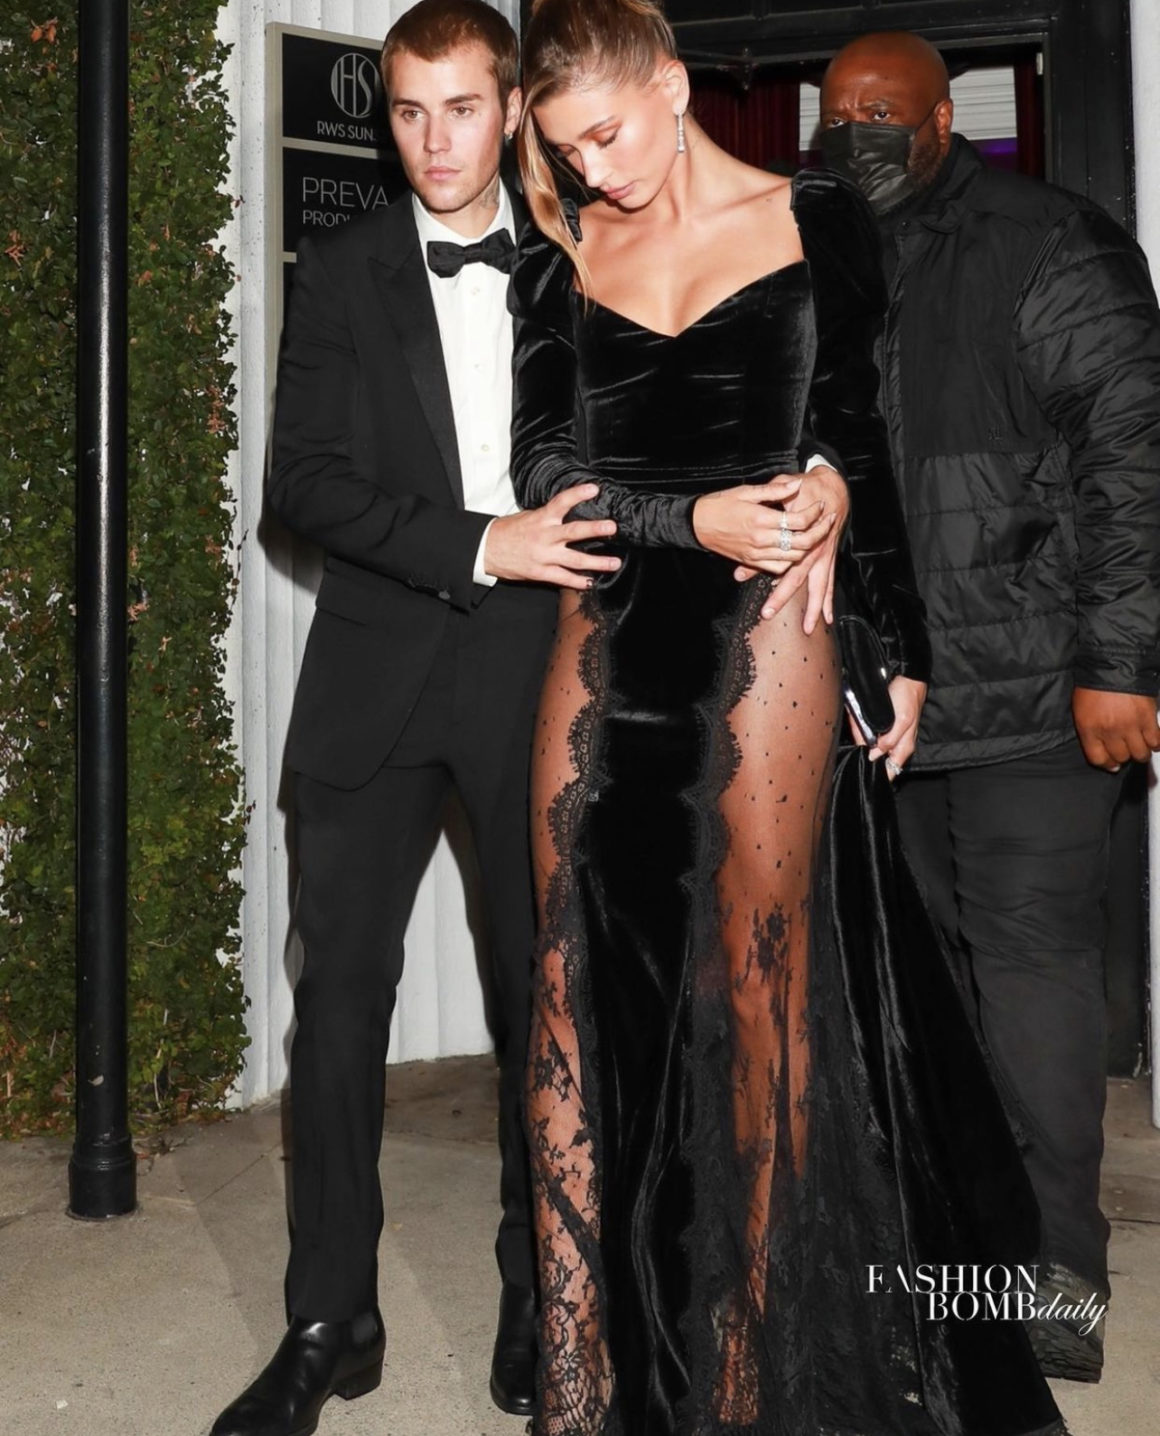 Hailey Bieber Attends Justin Bieber's 'Freedom Art Experience' Exhibition in LA Wearing Alessandra Rich Fall 2021 Black Velvet Lace Dress